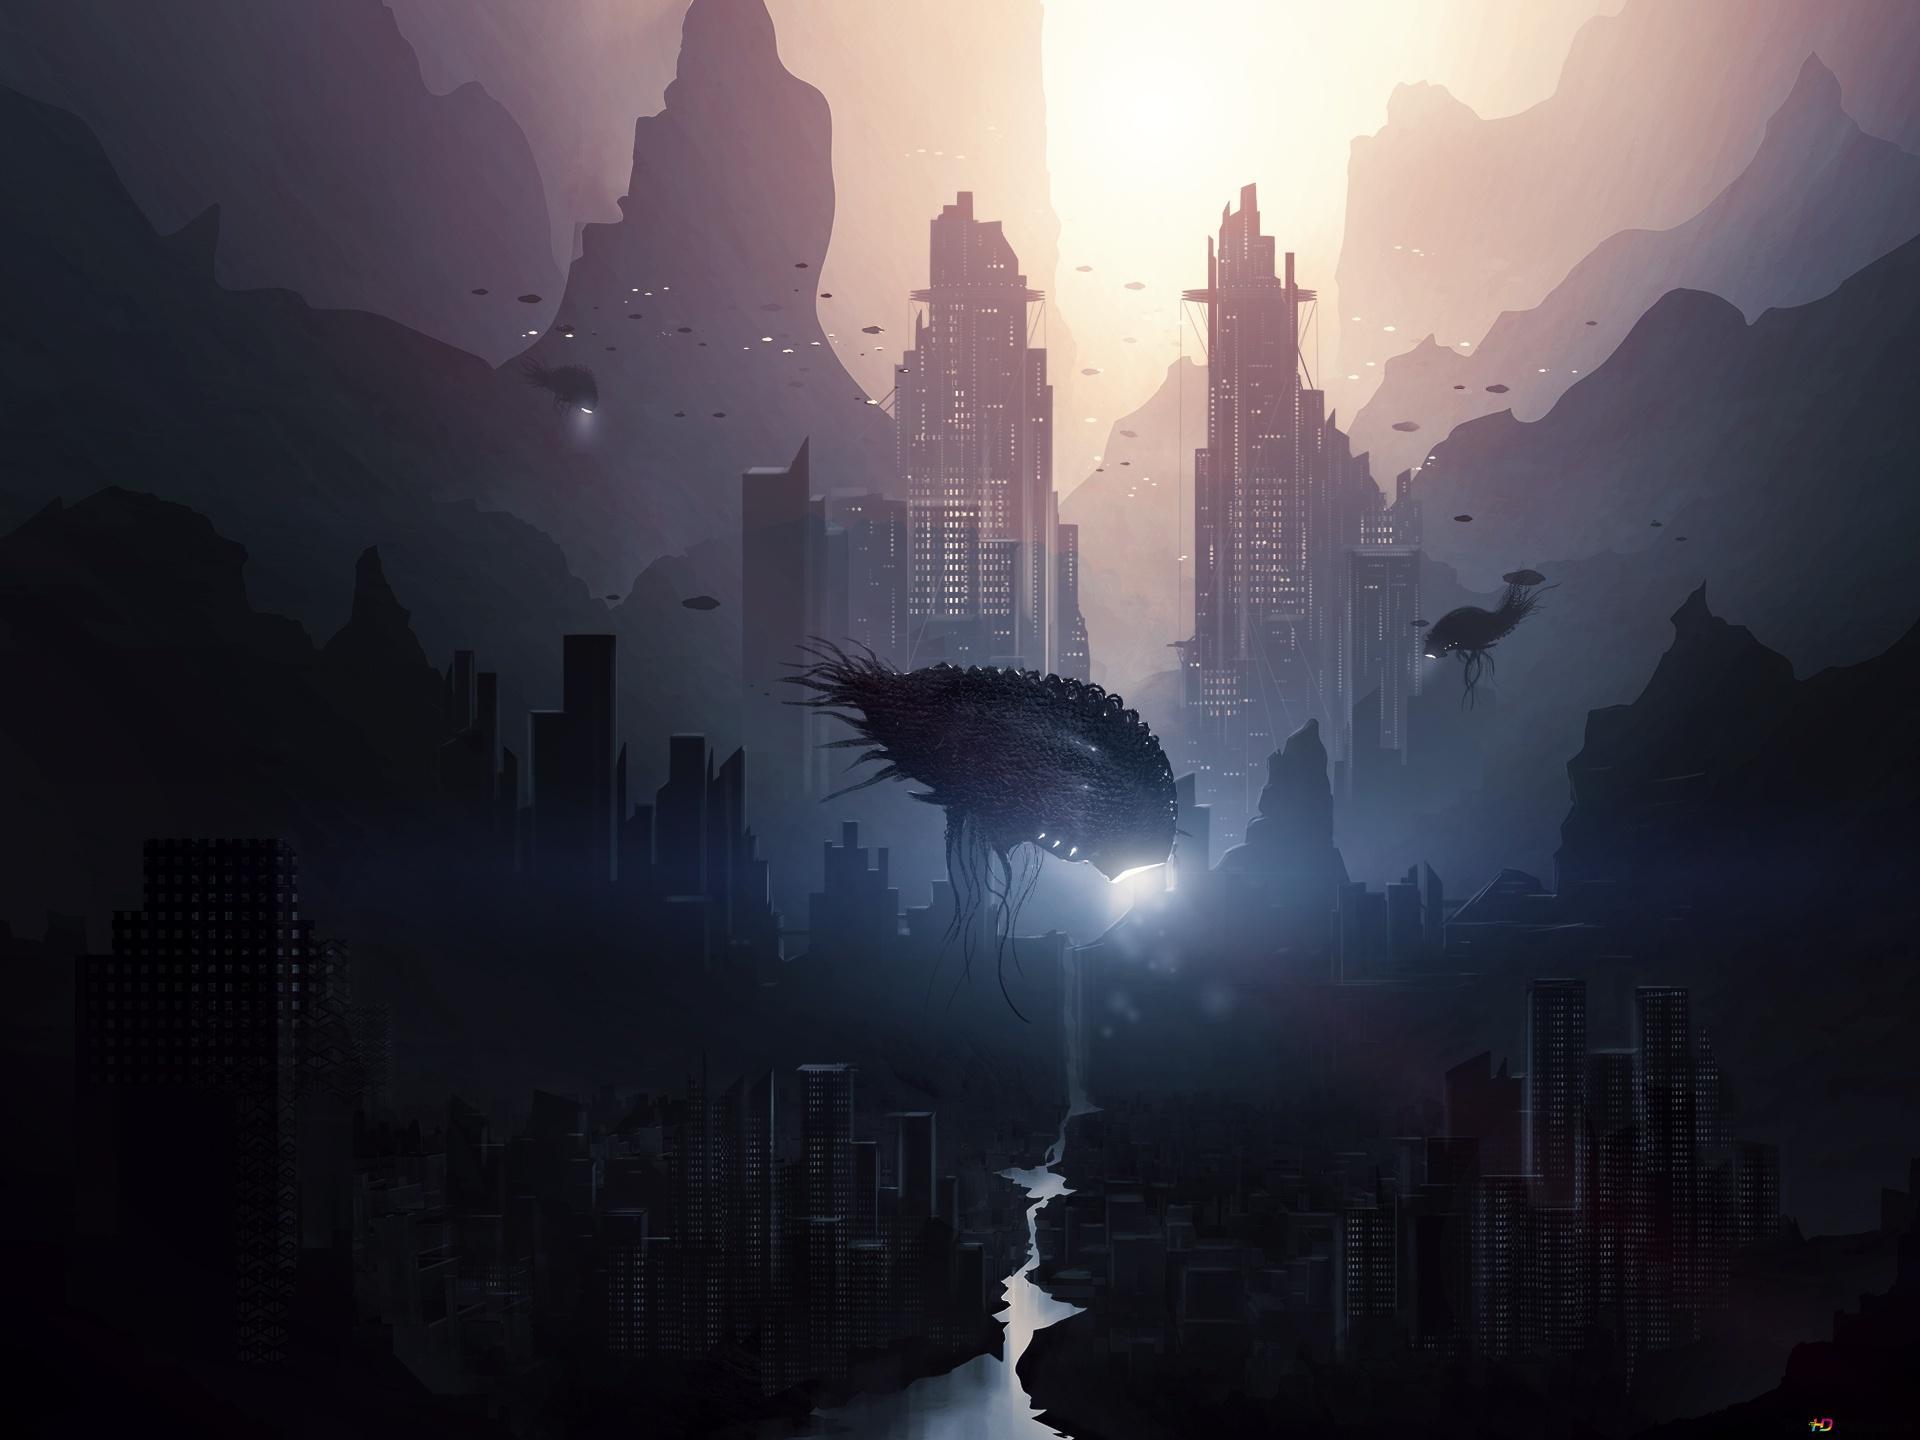 Alien Invasion Hd Wallpaper Download